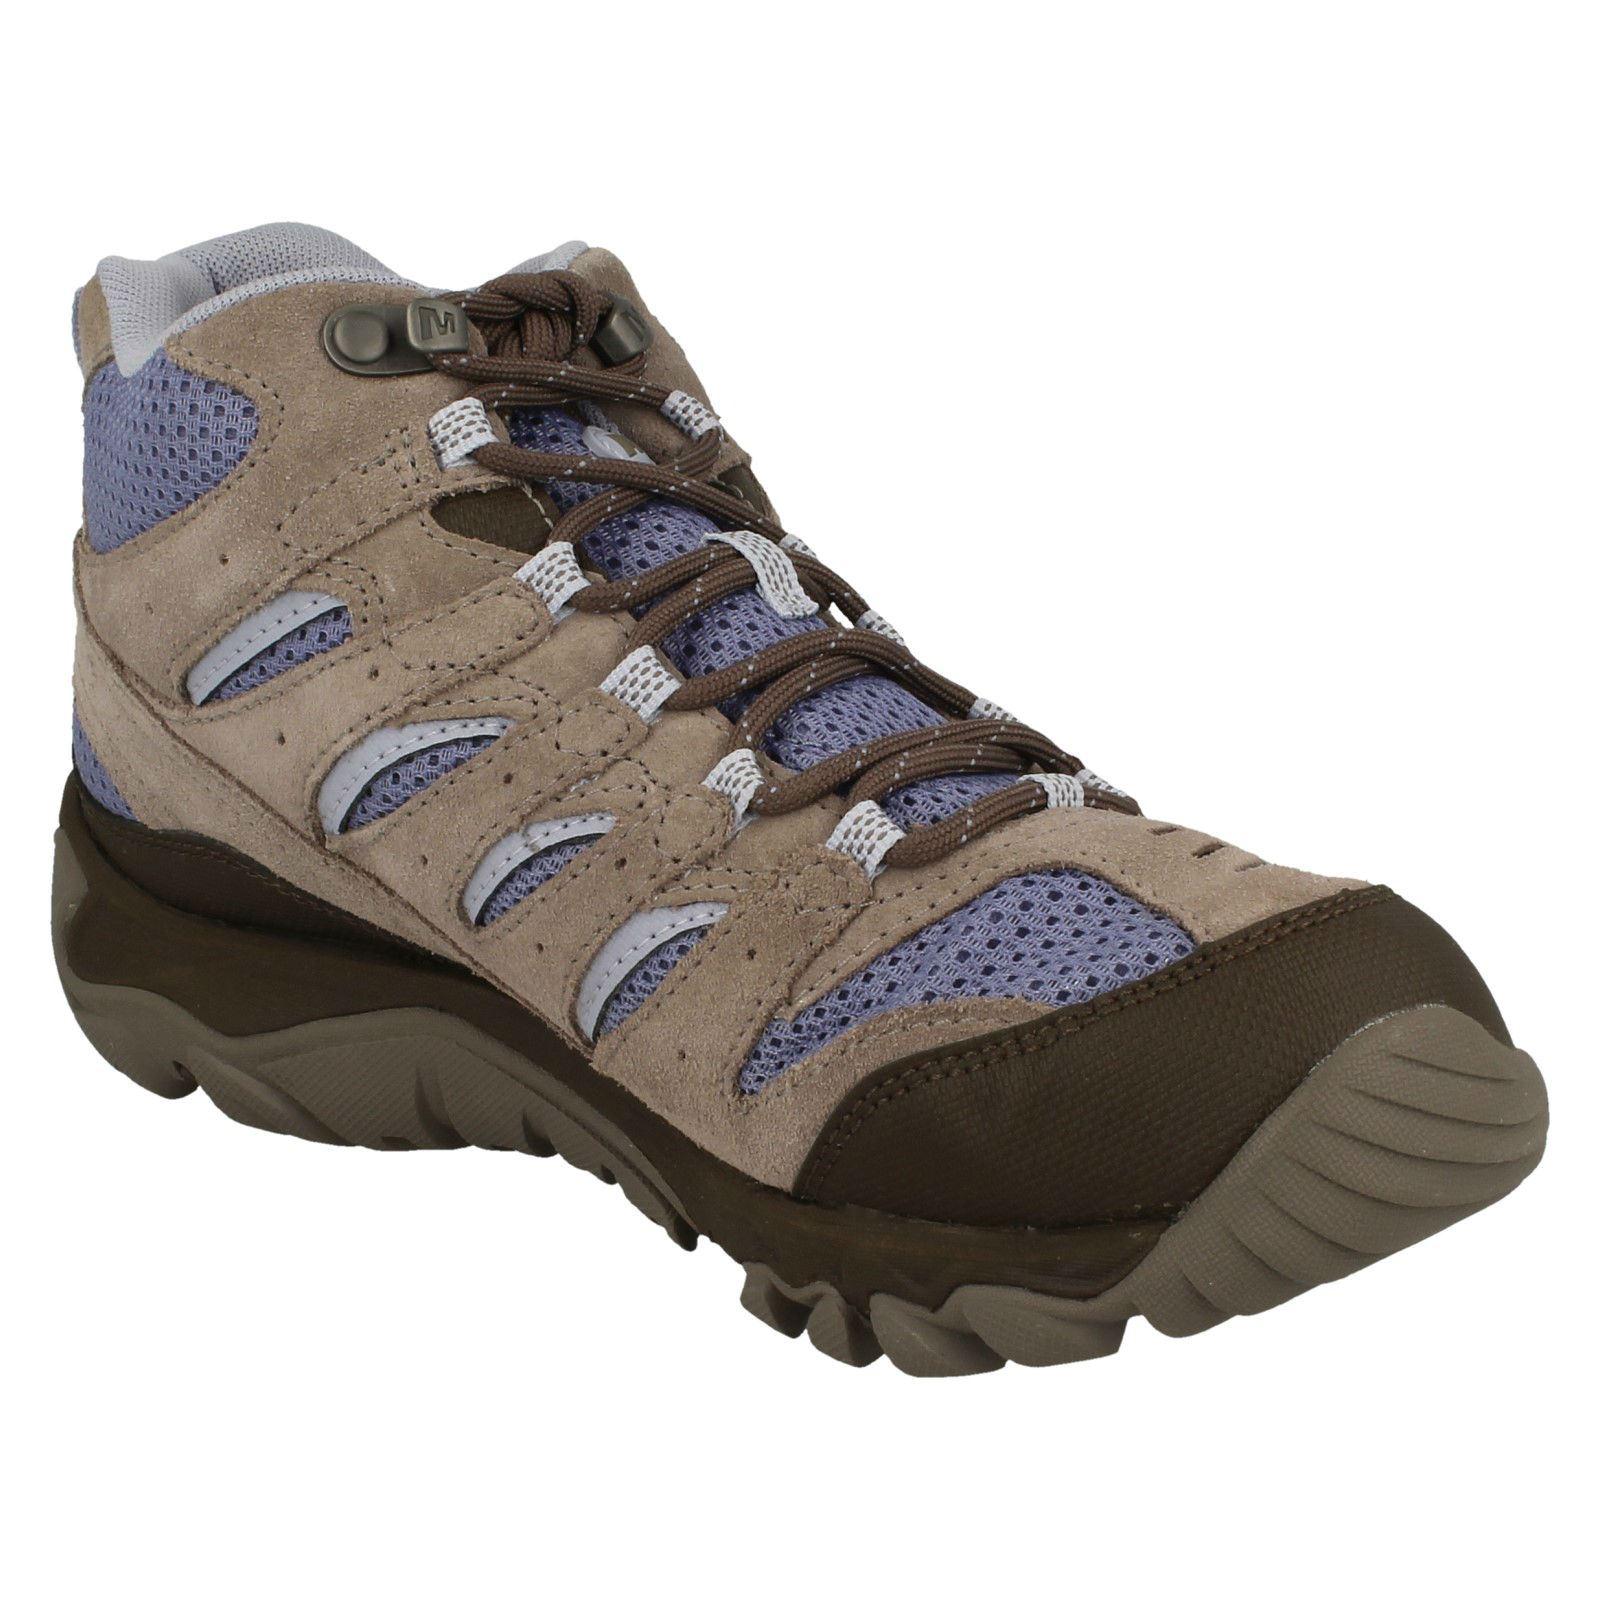 Pikolinos Kaki Womens Boots Seaweed 6  / US /  4 UK 6d8512